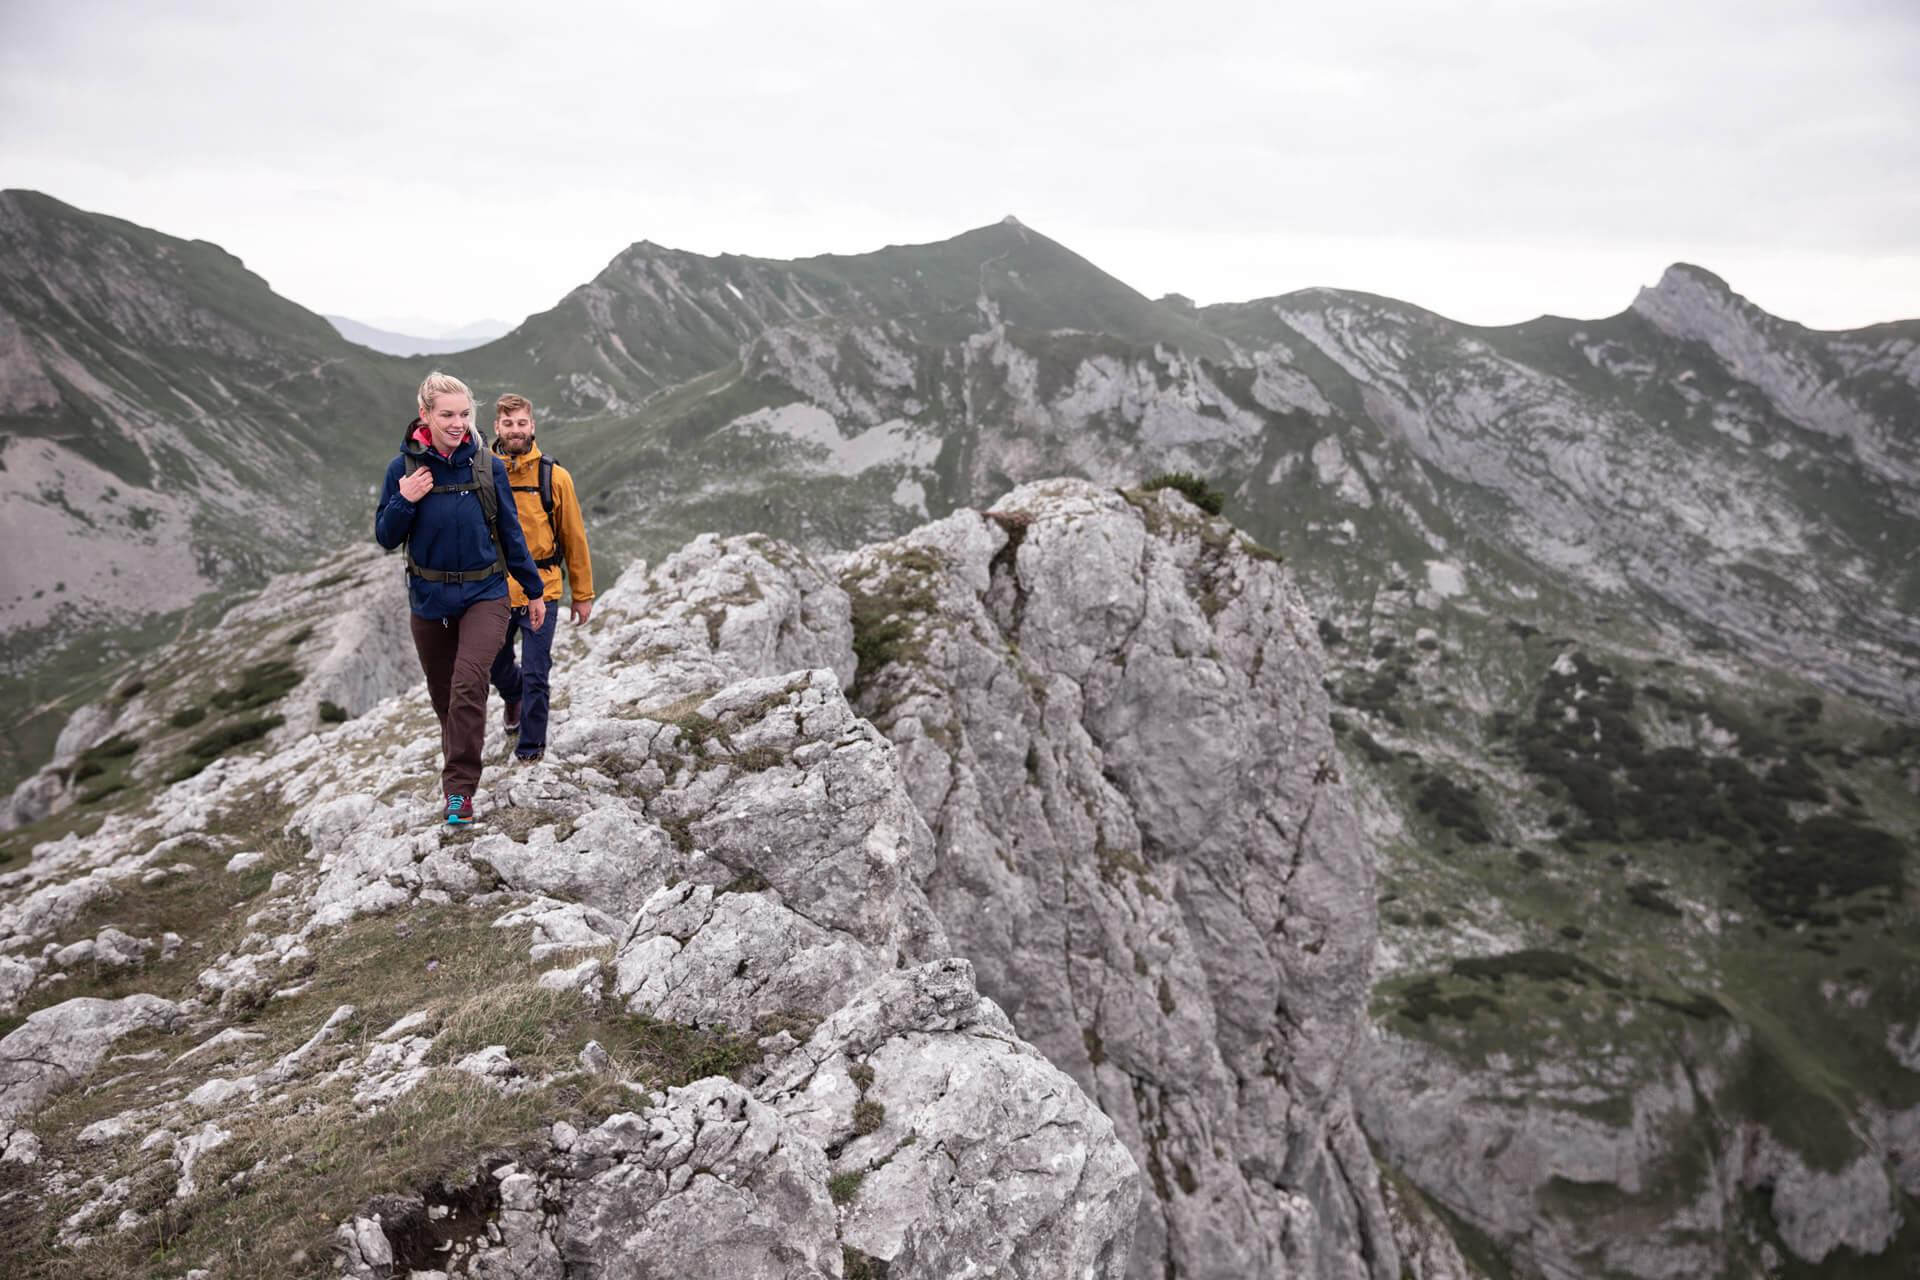 Hüttentouren in den Alpen - zwei Wanderer in den Bergen.